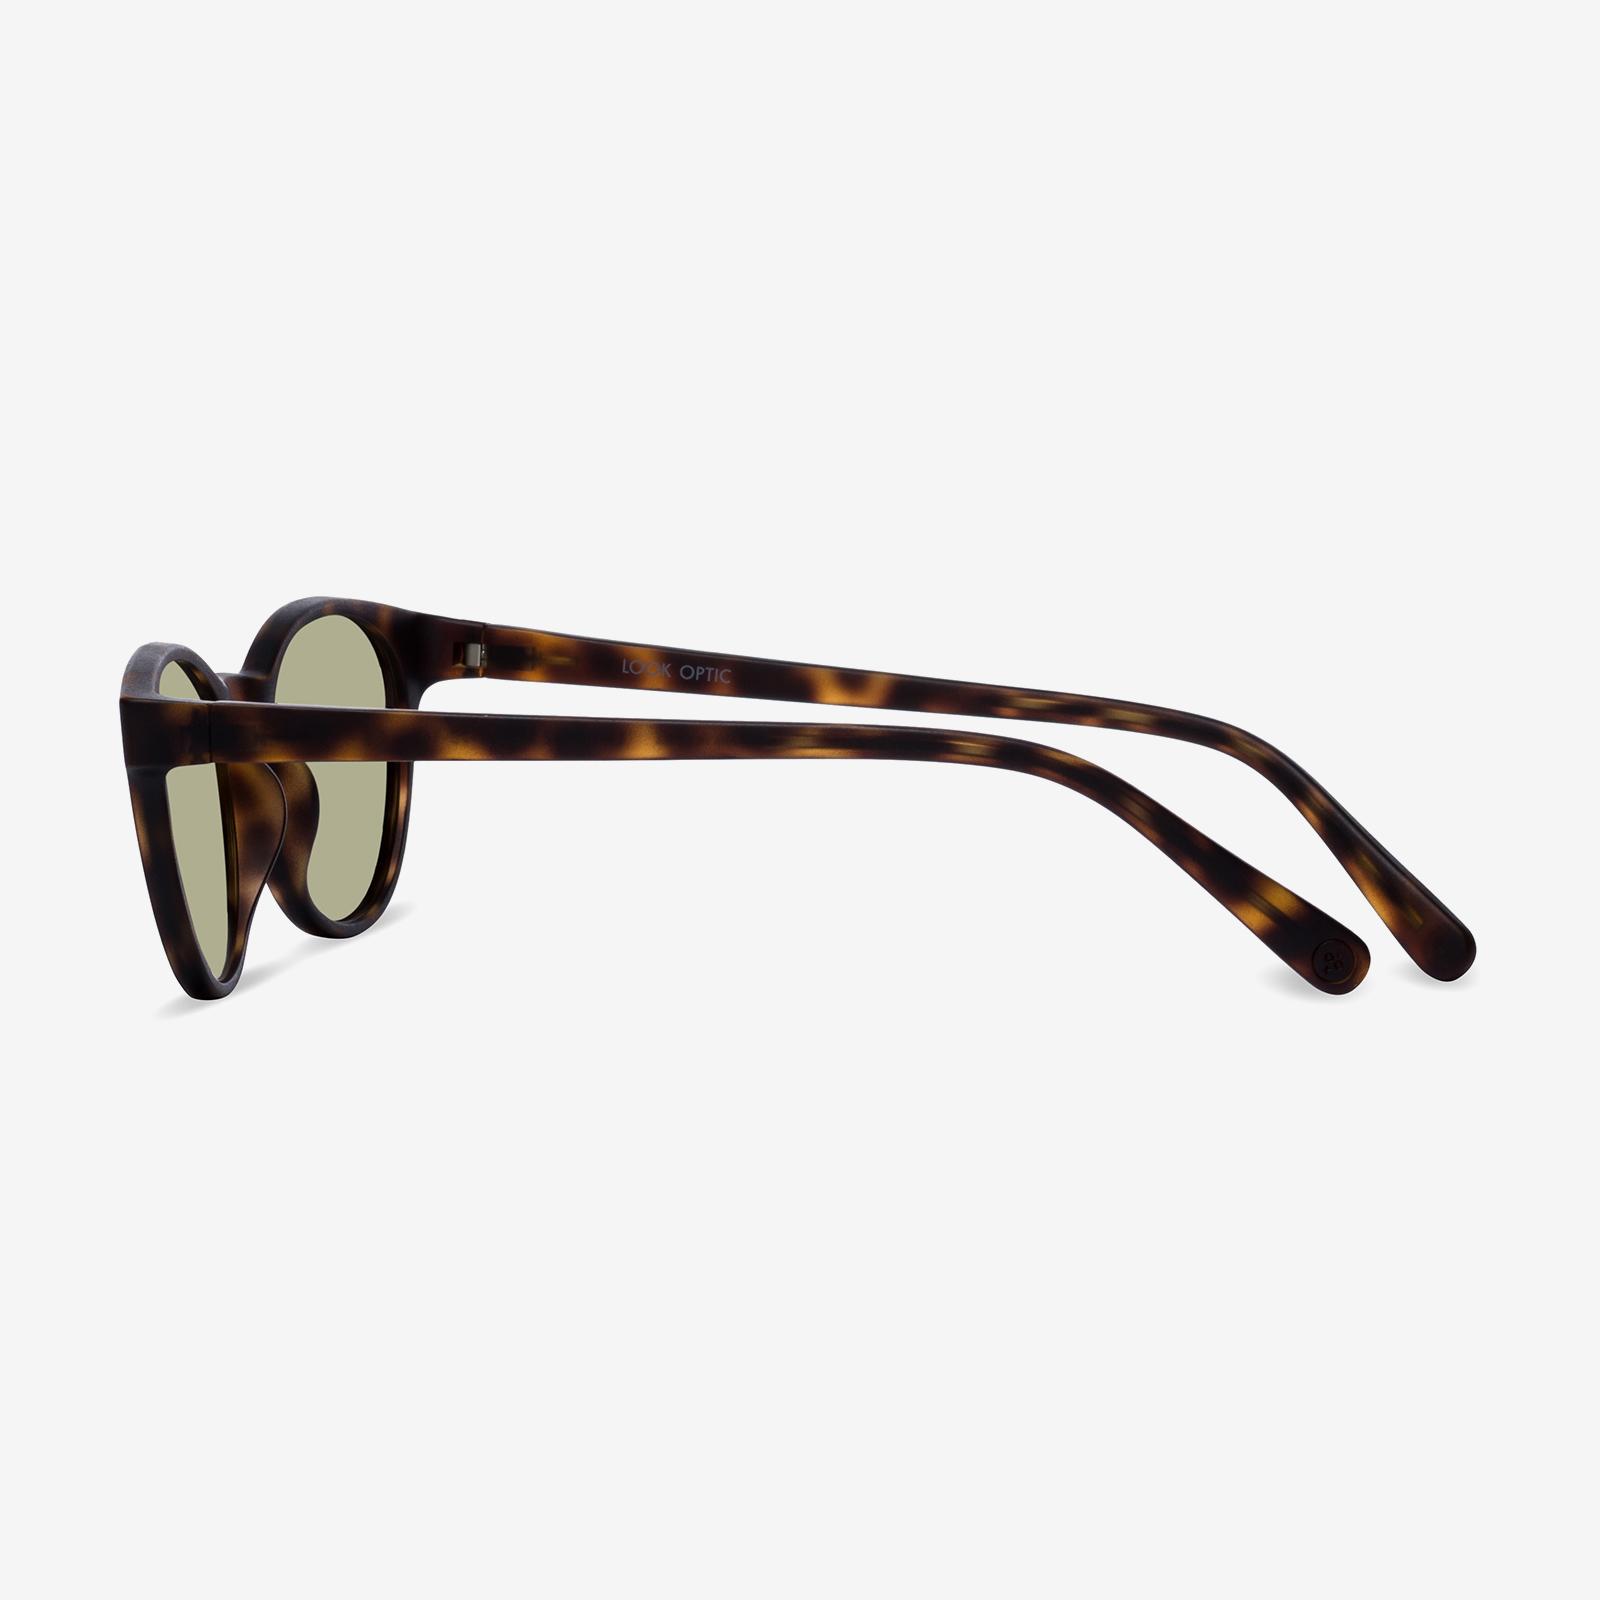 Sunglasses product photo